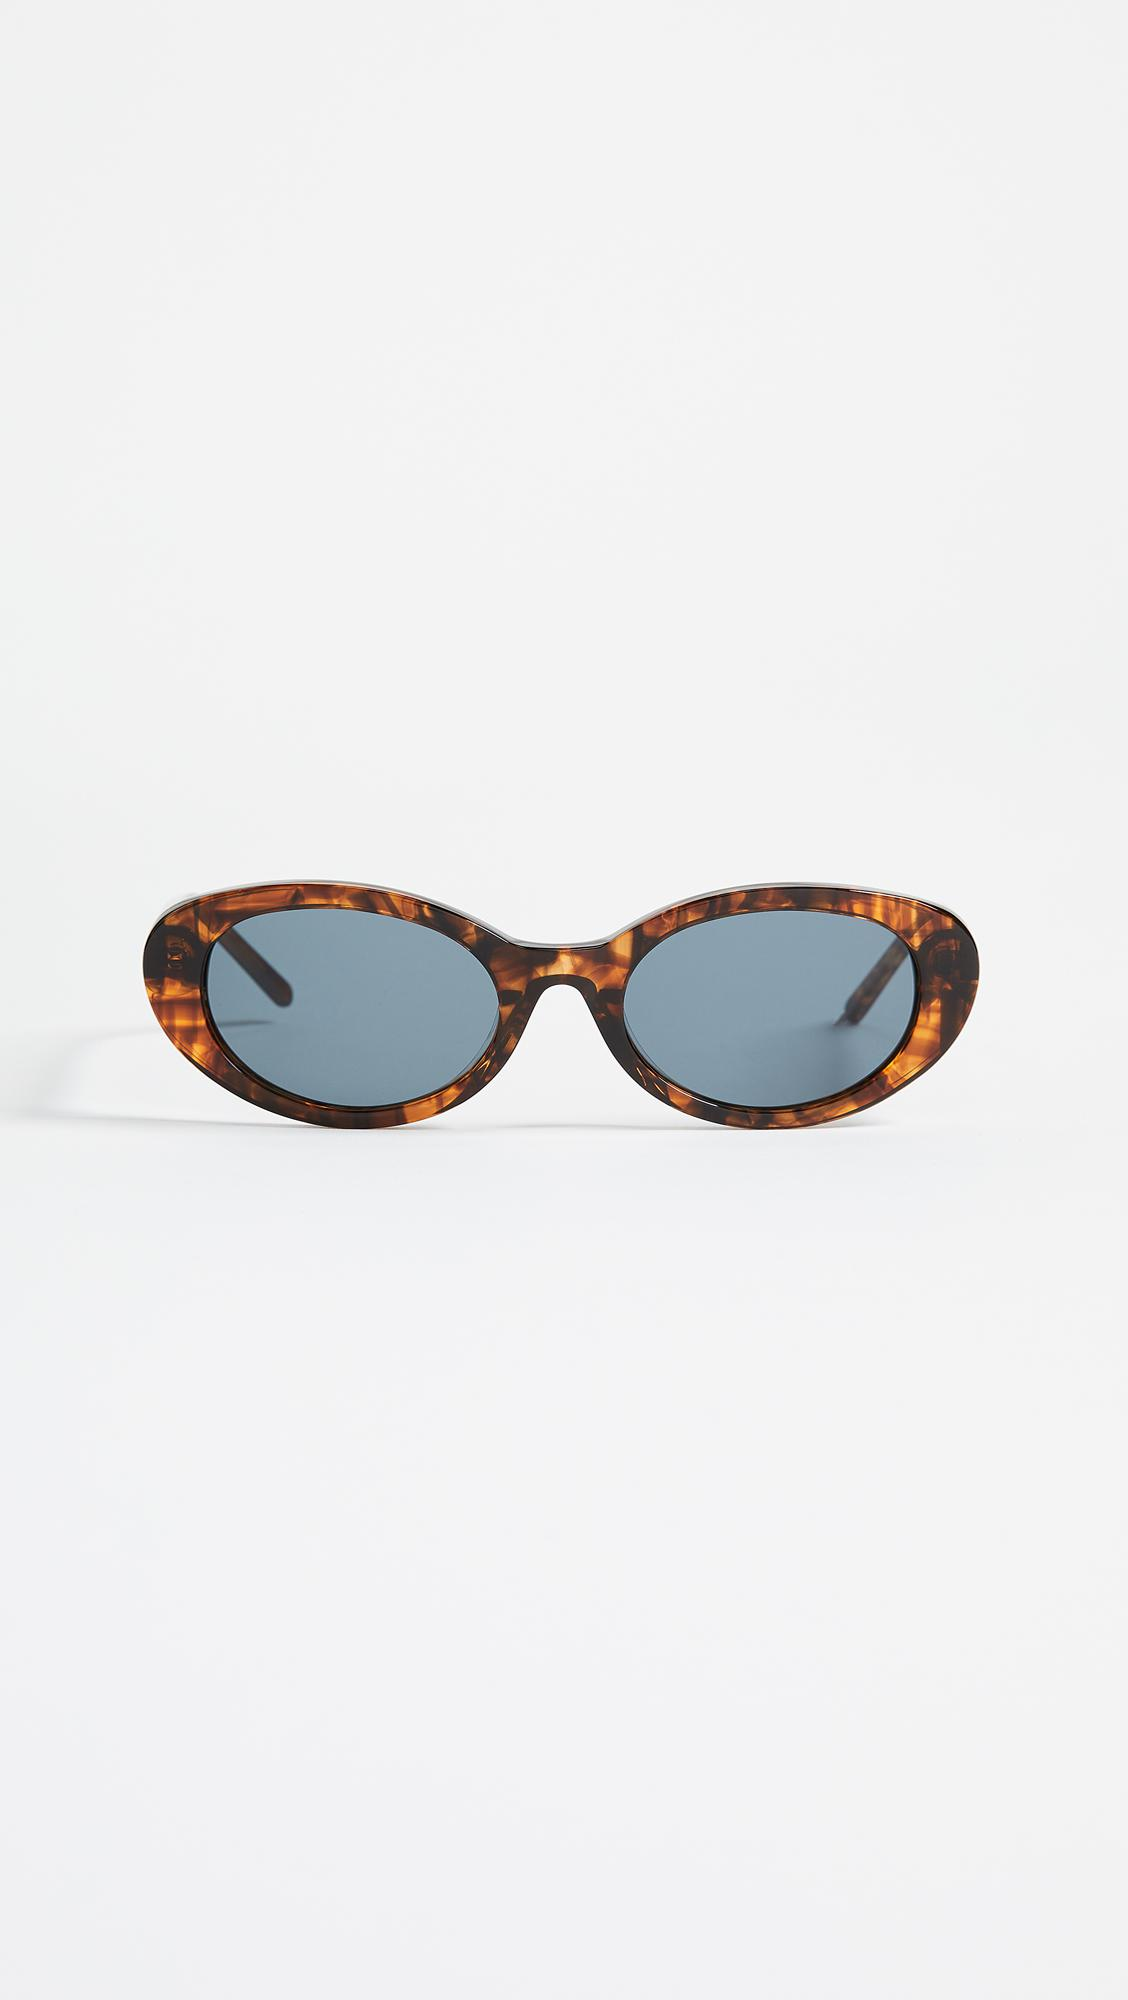 Frances Oval-frame Acetate Sunglasses - Black Roberi & Fraud Best Seller Cheap Price Cheap Affordable Great Deals Online 3K5ZvyYY1W